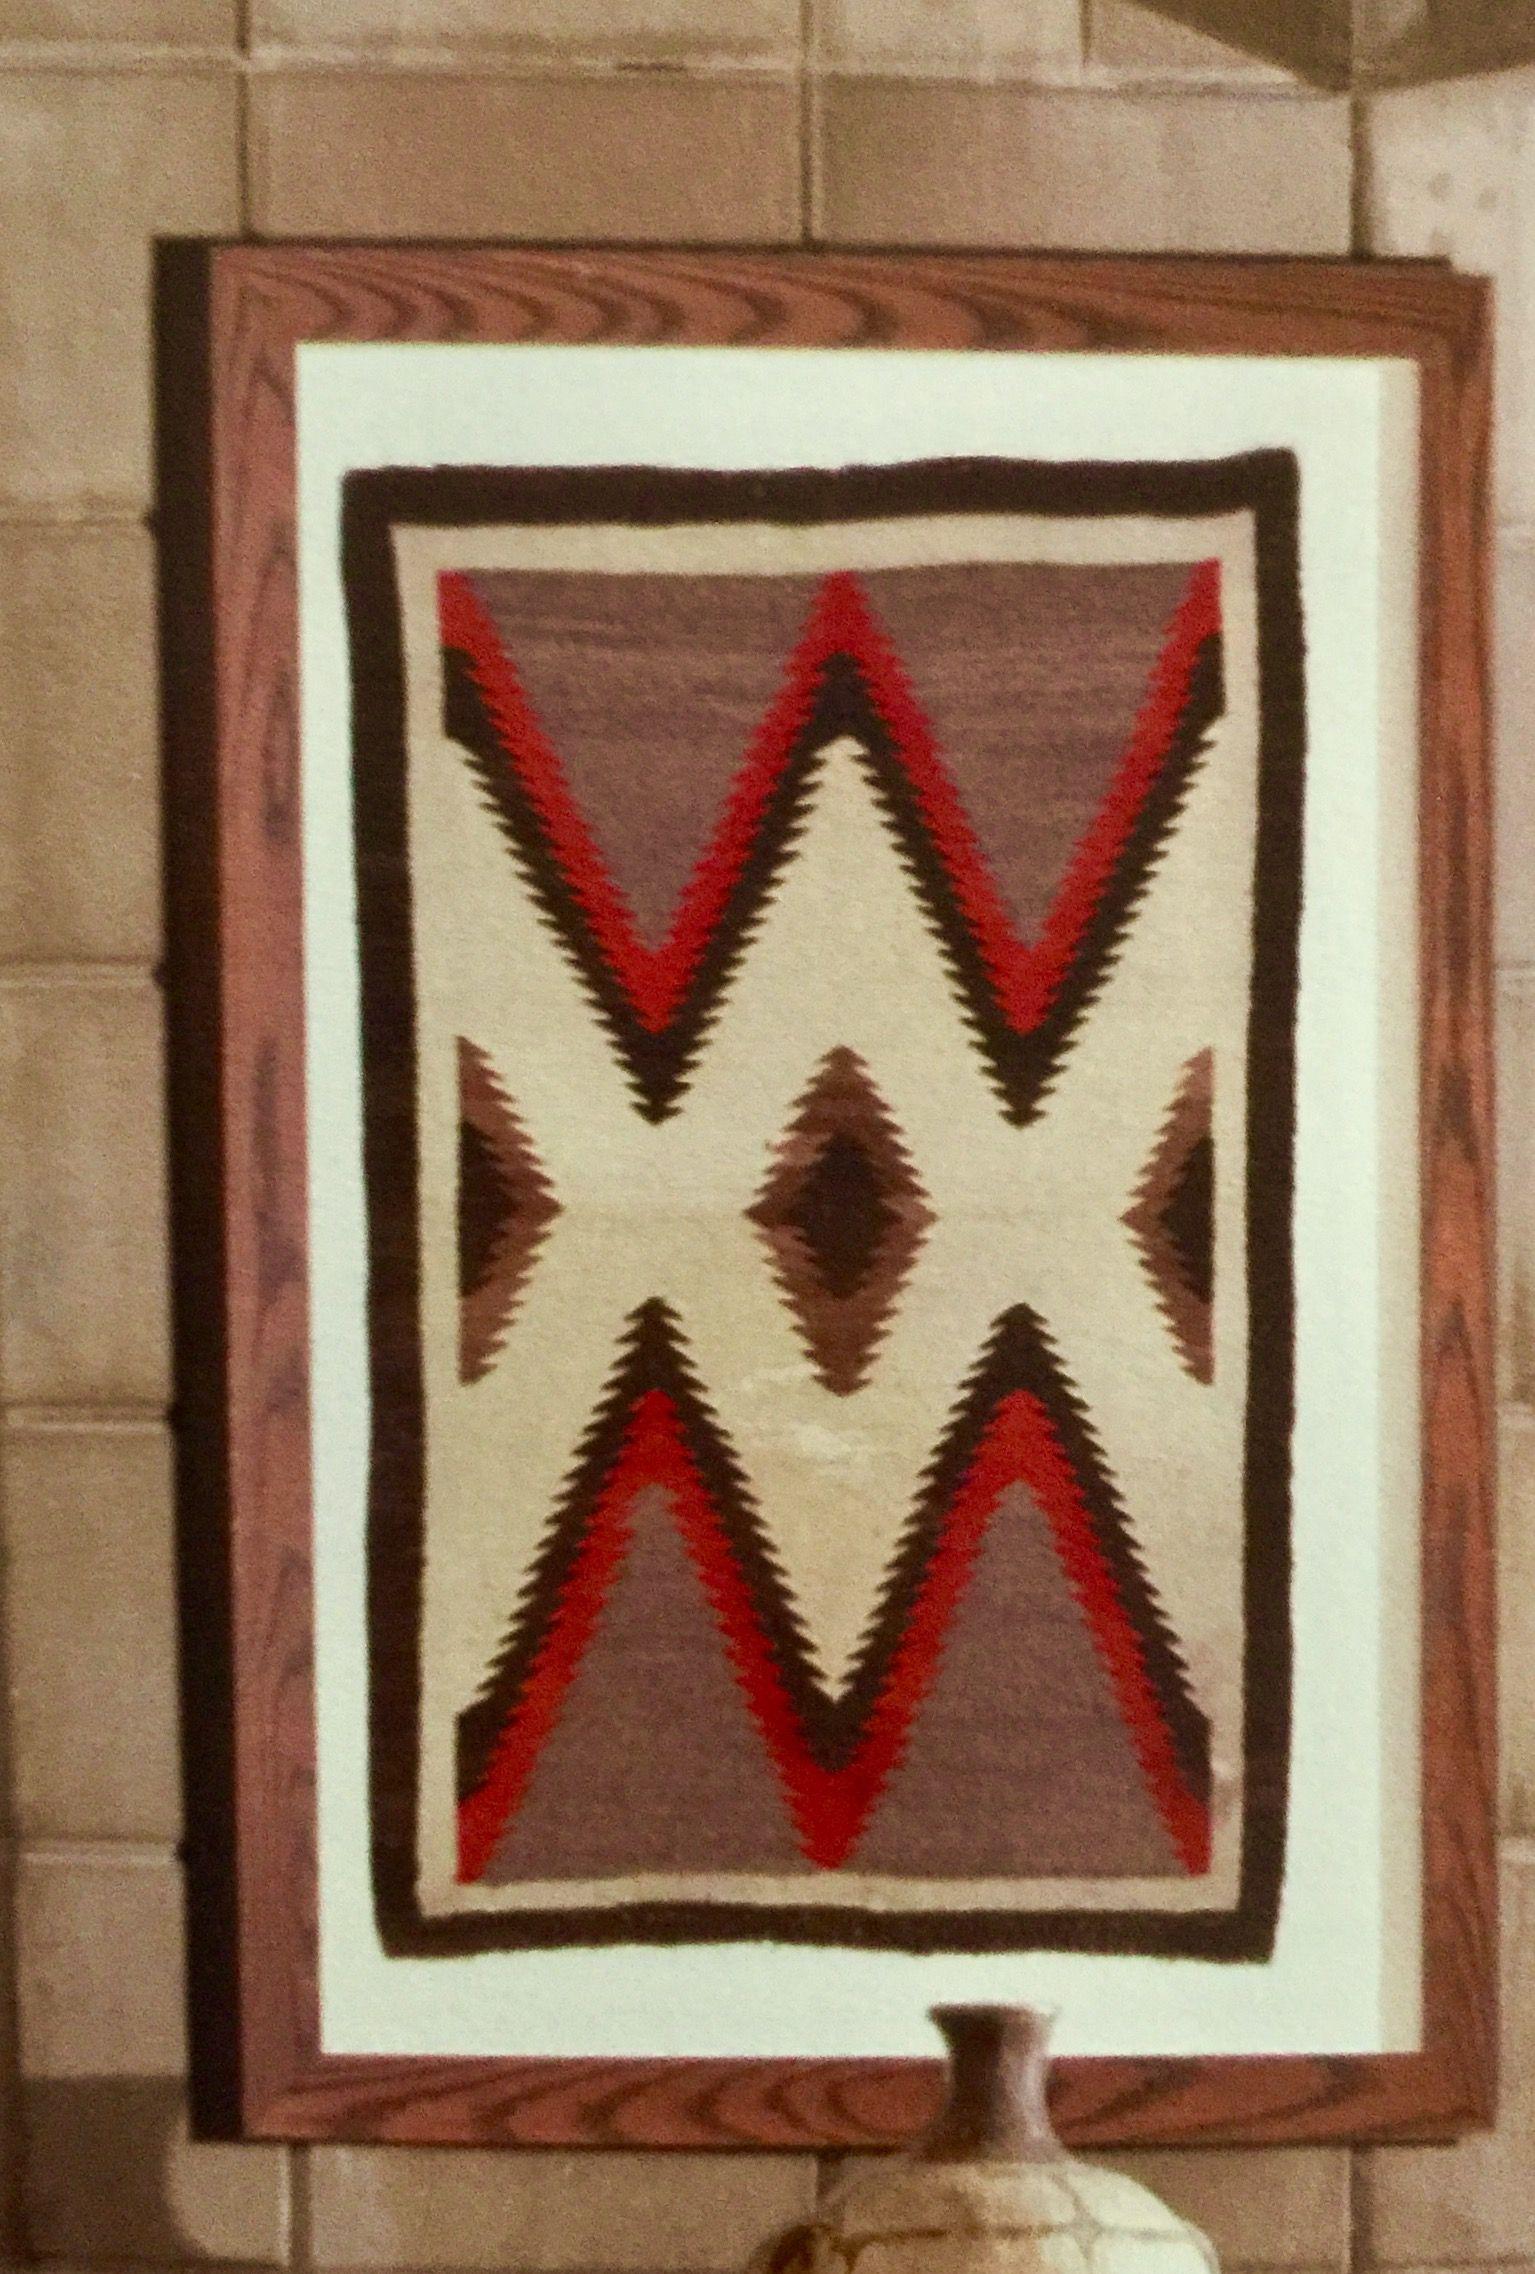 Framed Navajo Textile At The Arizona Biltmore Resort Weaving Rugs Indian Artifacts